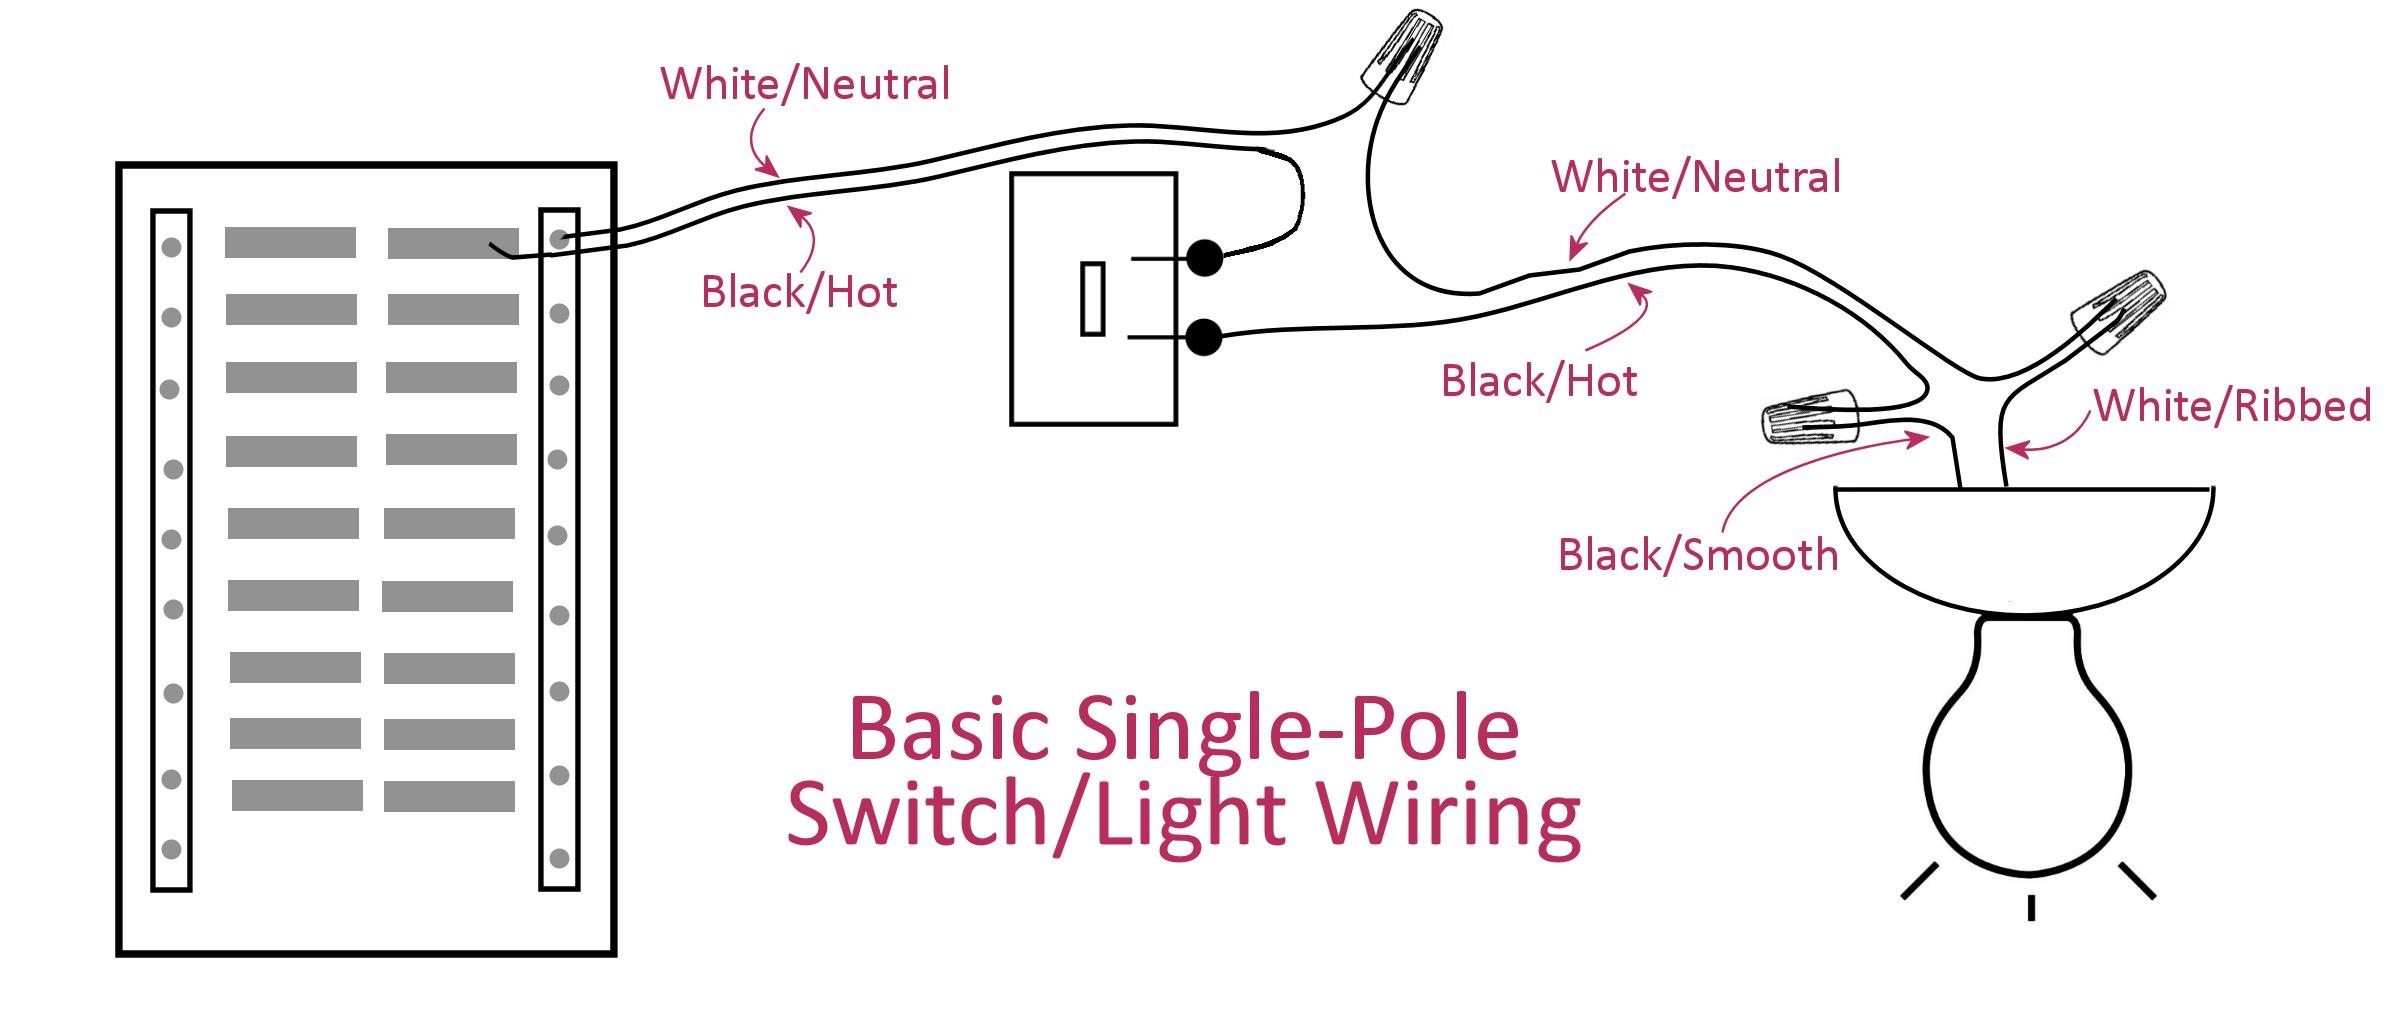 Pleasant Wiring Diagram Basic Light Switch New Electrical Basics Wiring A Wiring Cloud Lukepaidewilluminateatxorg